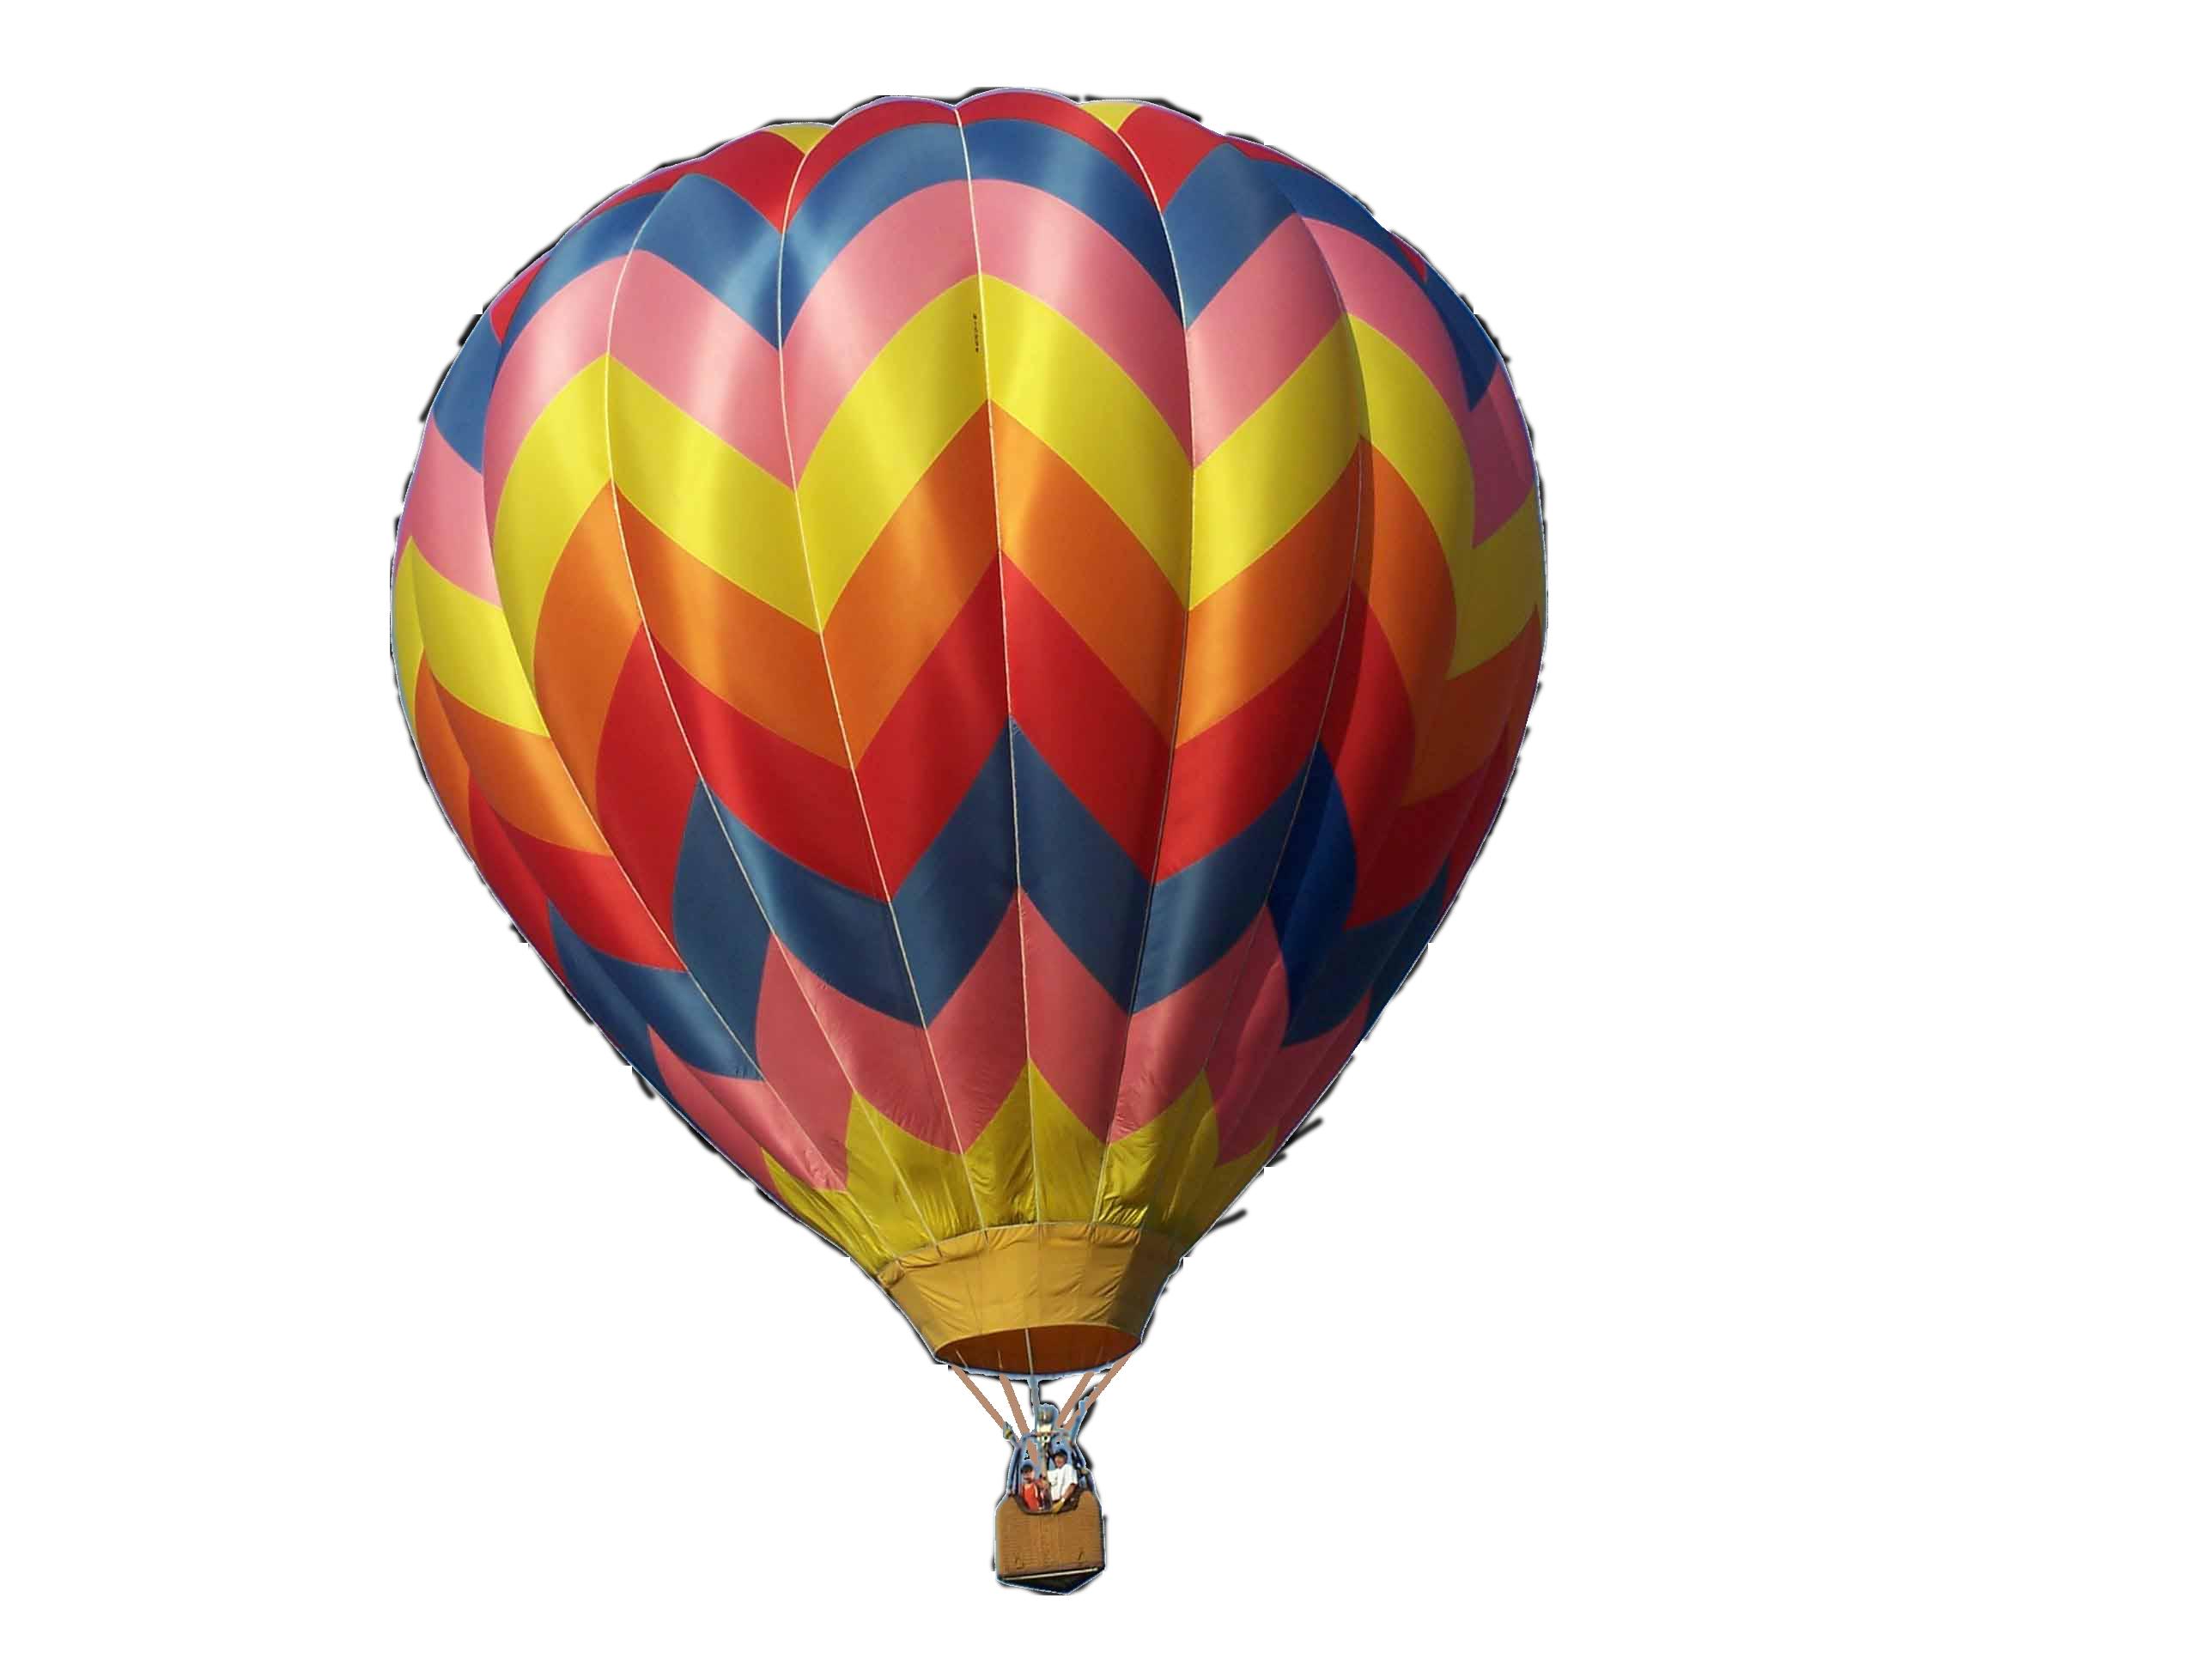 Balon Udara PNG - 82920